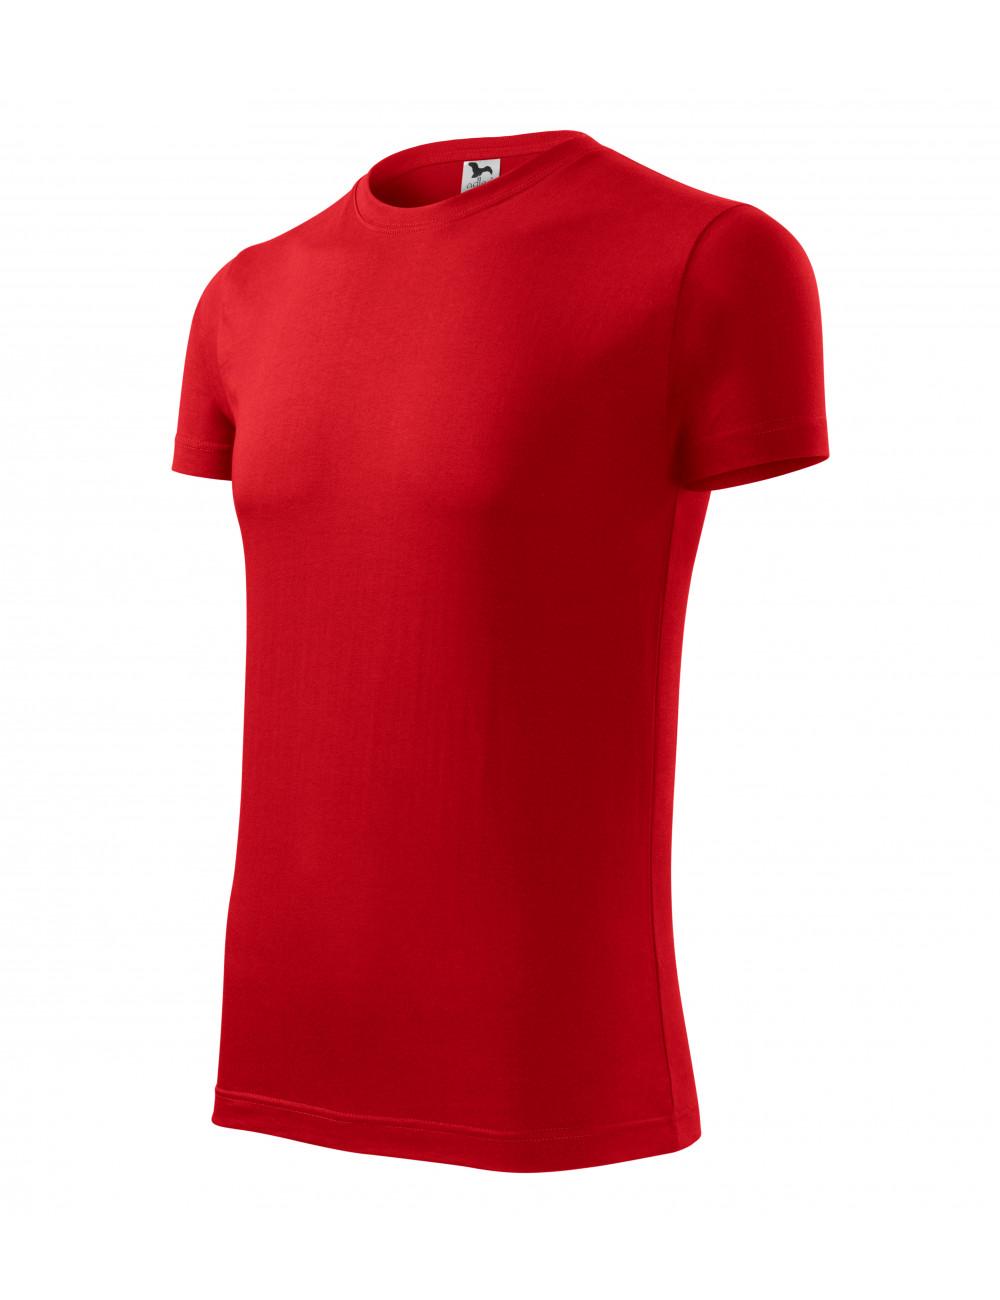 Adler MALFINI Koszulka męska Viper 143 czerwony